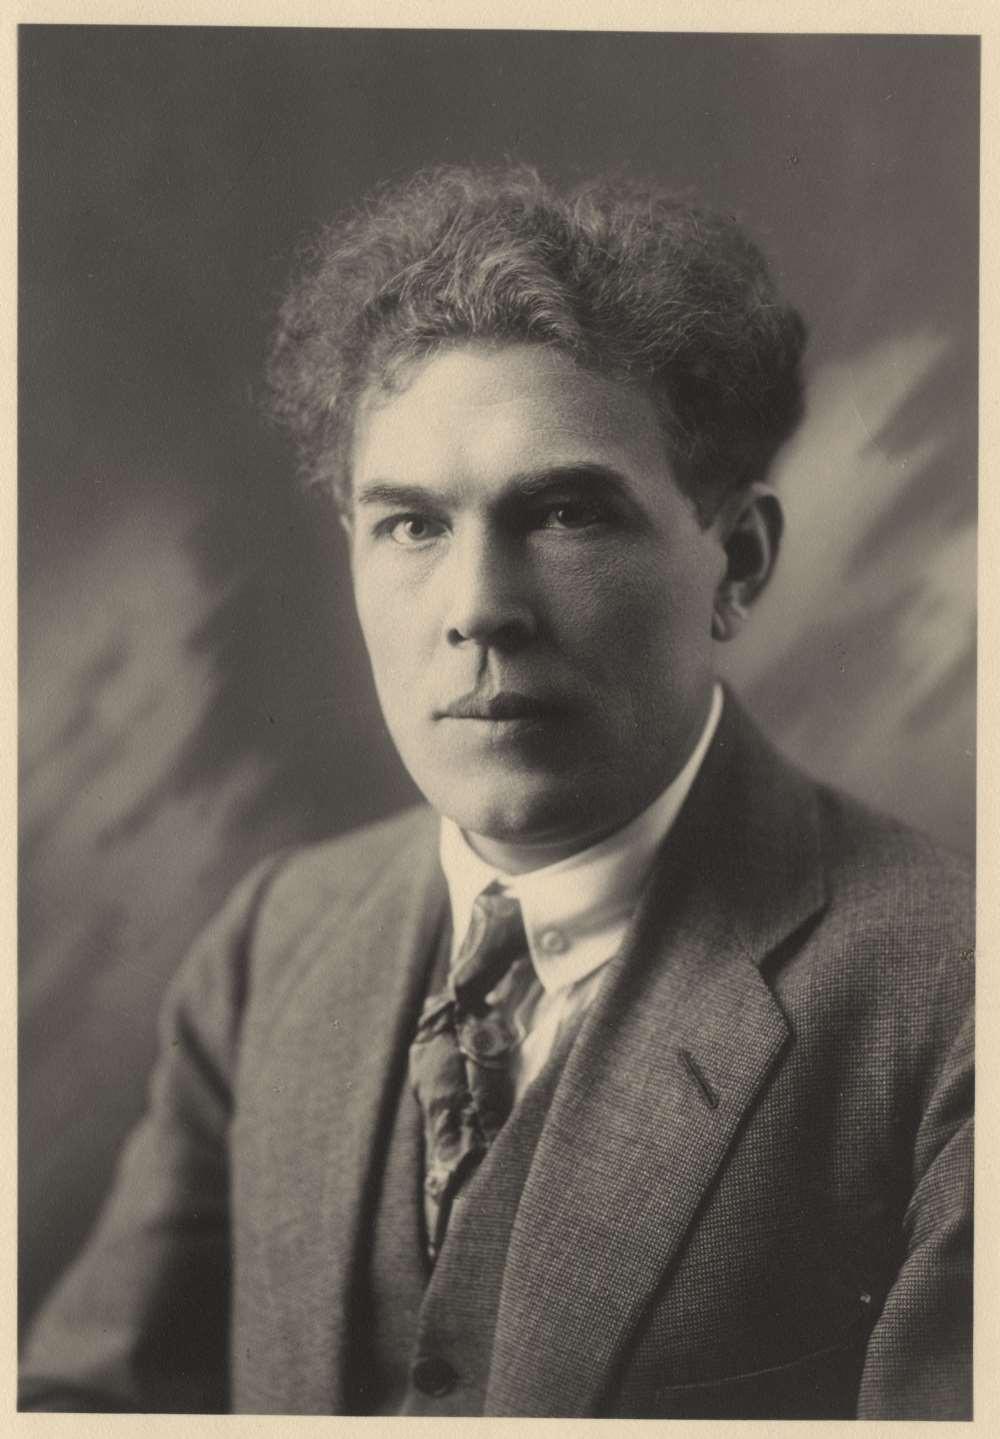 Heino Eller 1920. aastate I poolel. FOTO ETMM